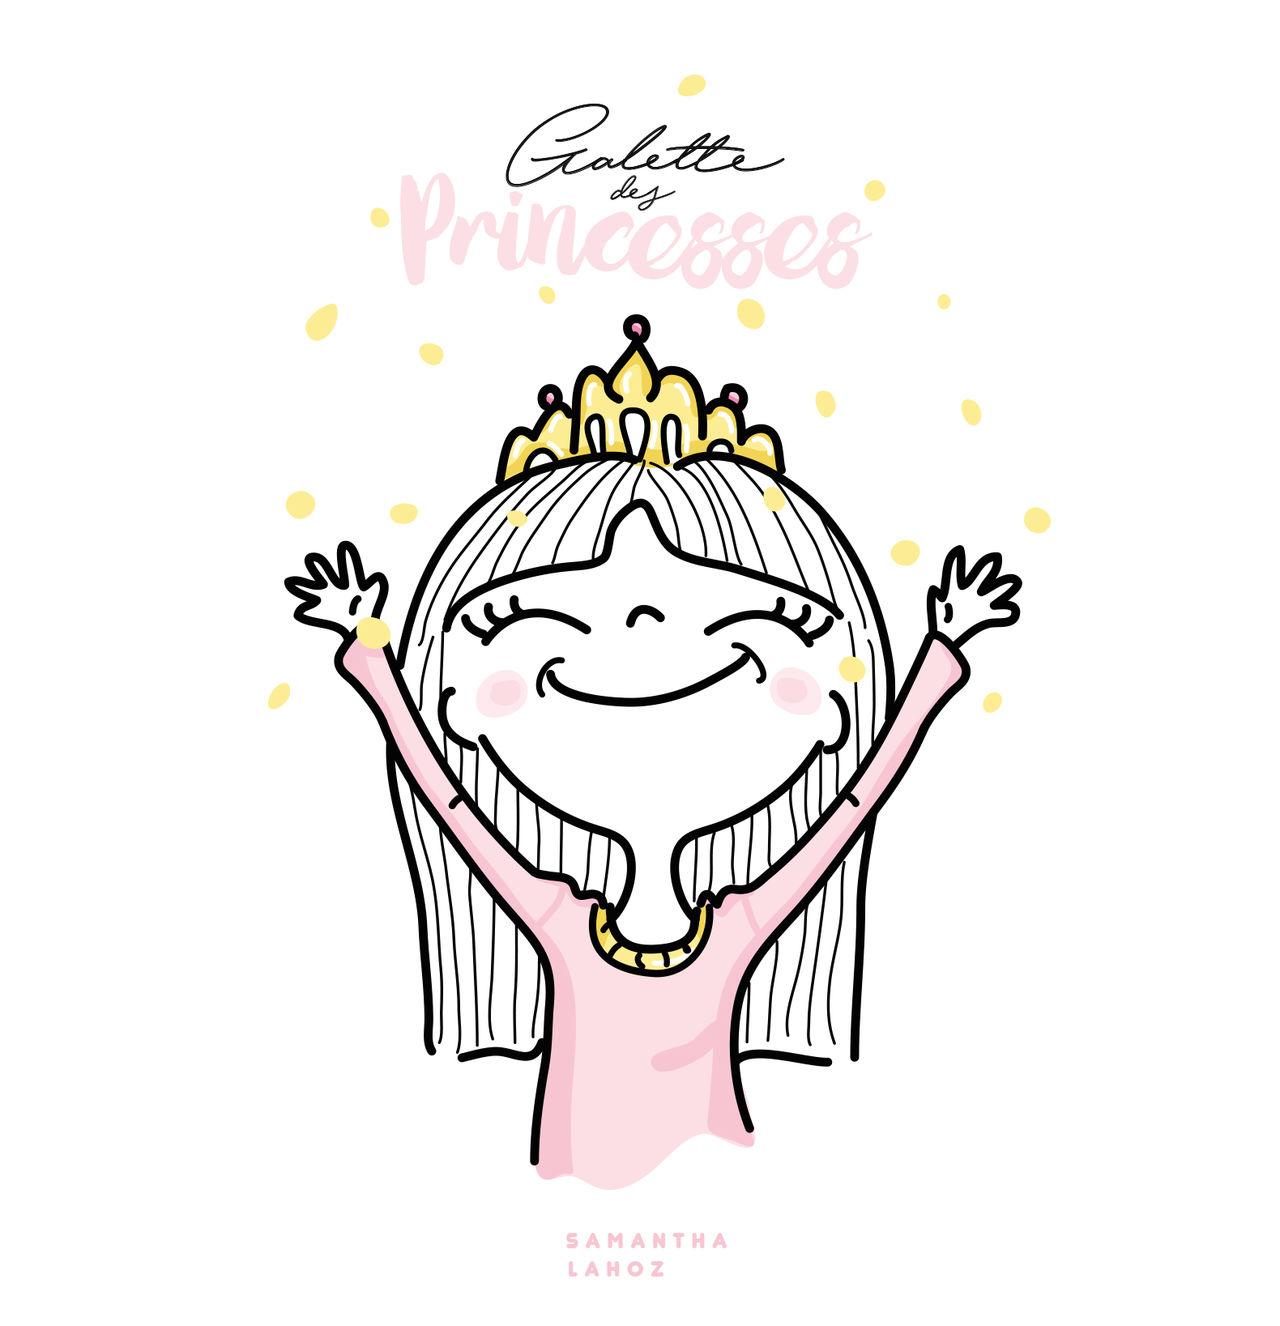 Princesse Galette